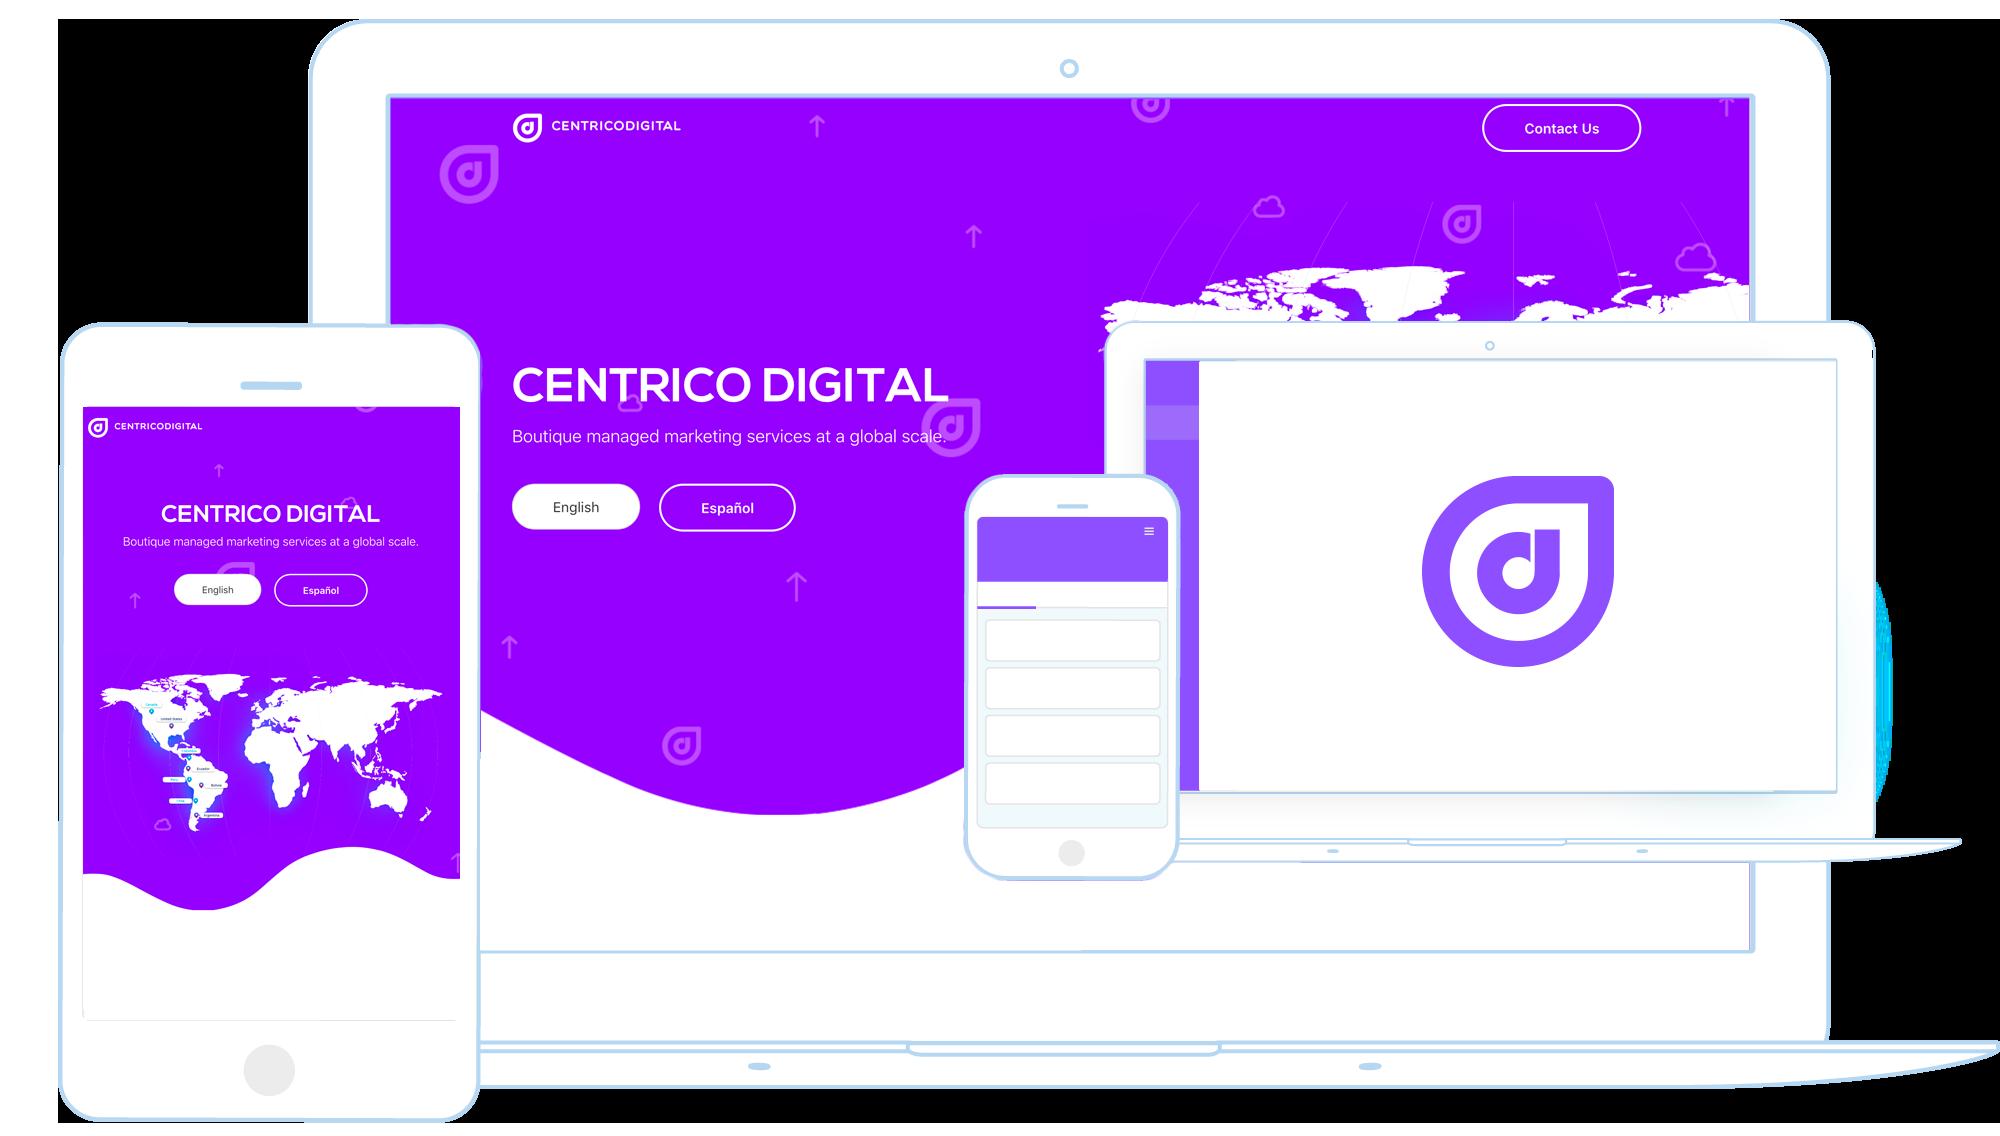 Centrico Digital